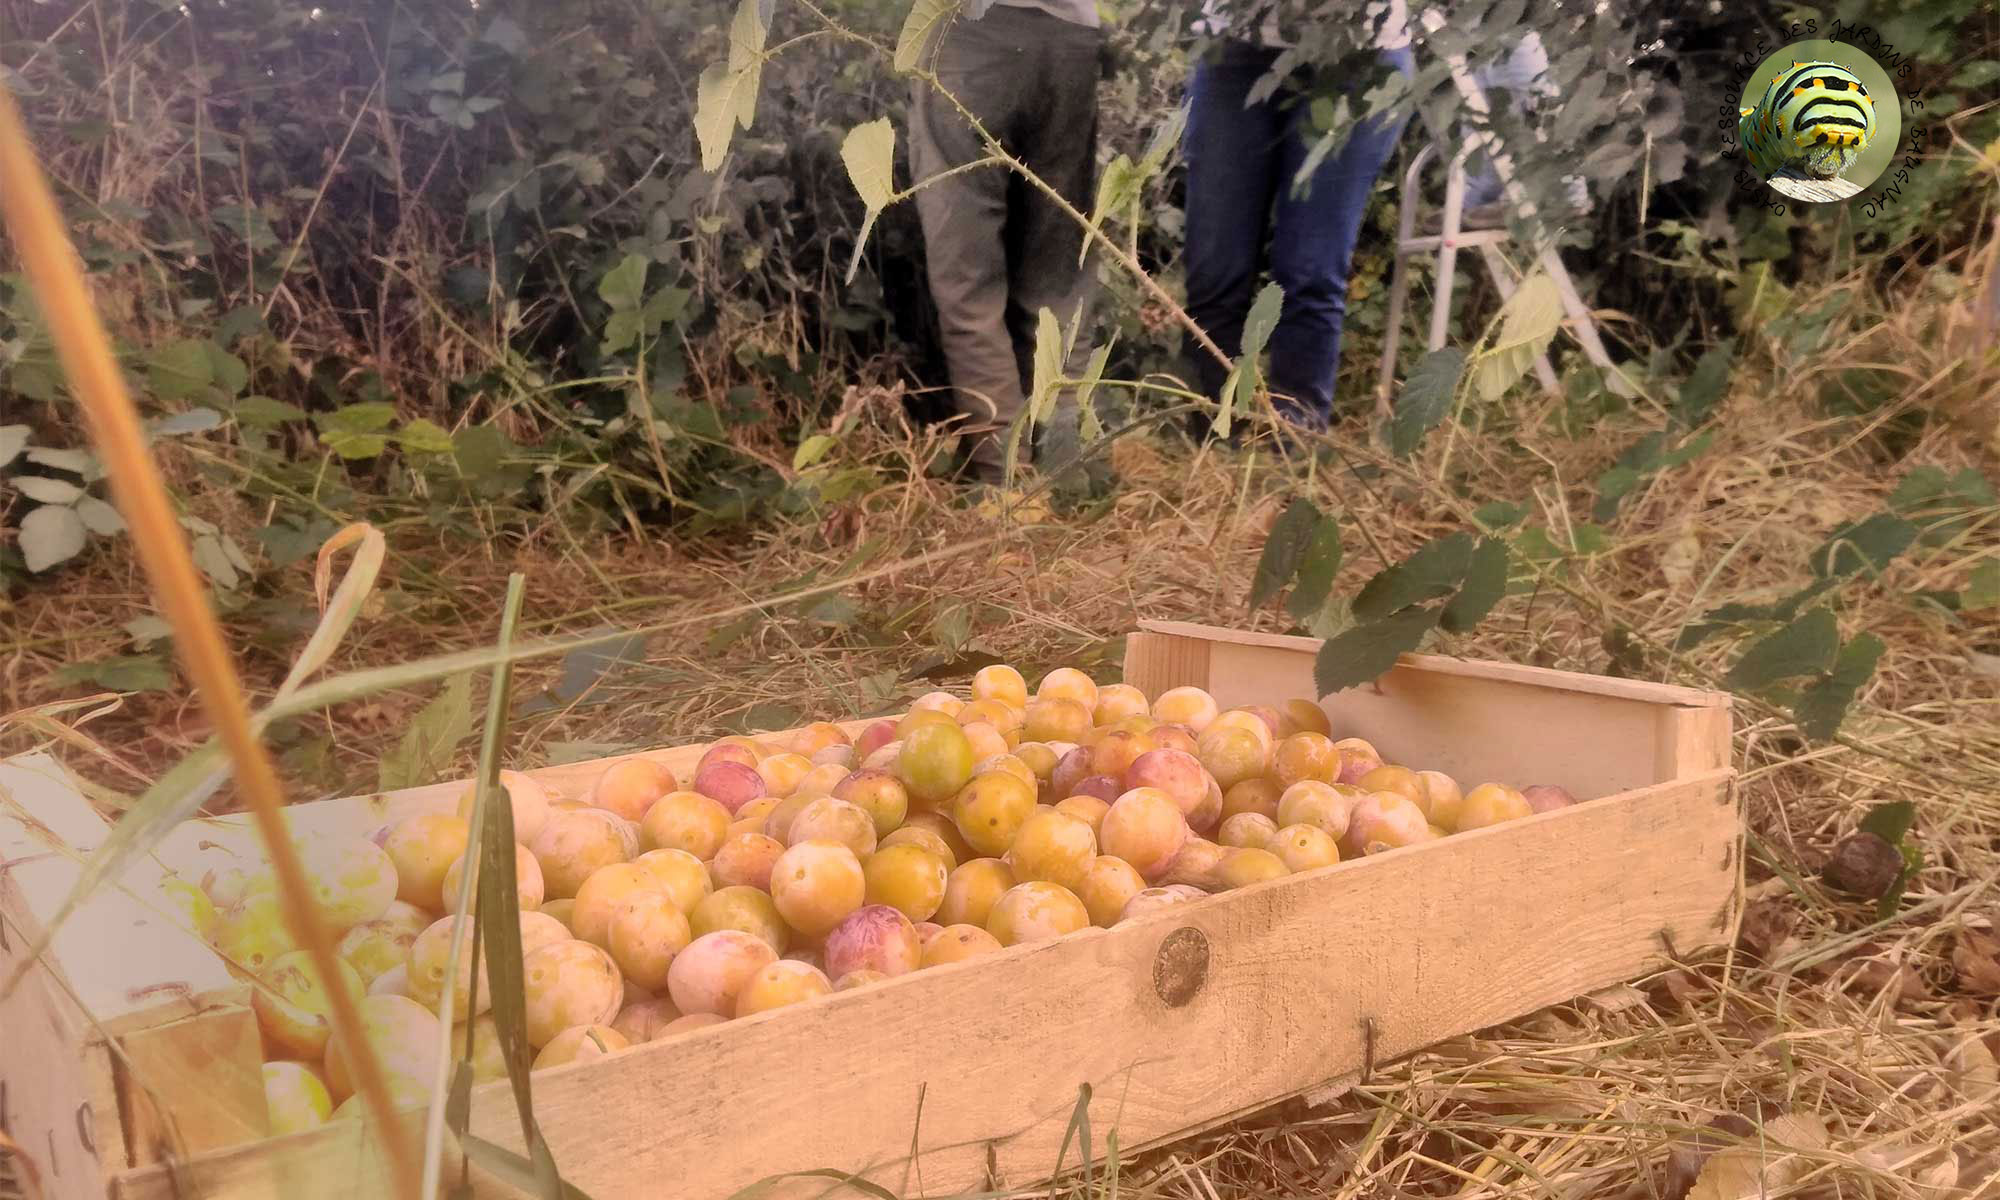 Auto-cueillette de Baugnac - Oasis ressource de Baugnac